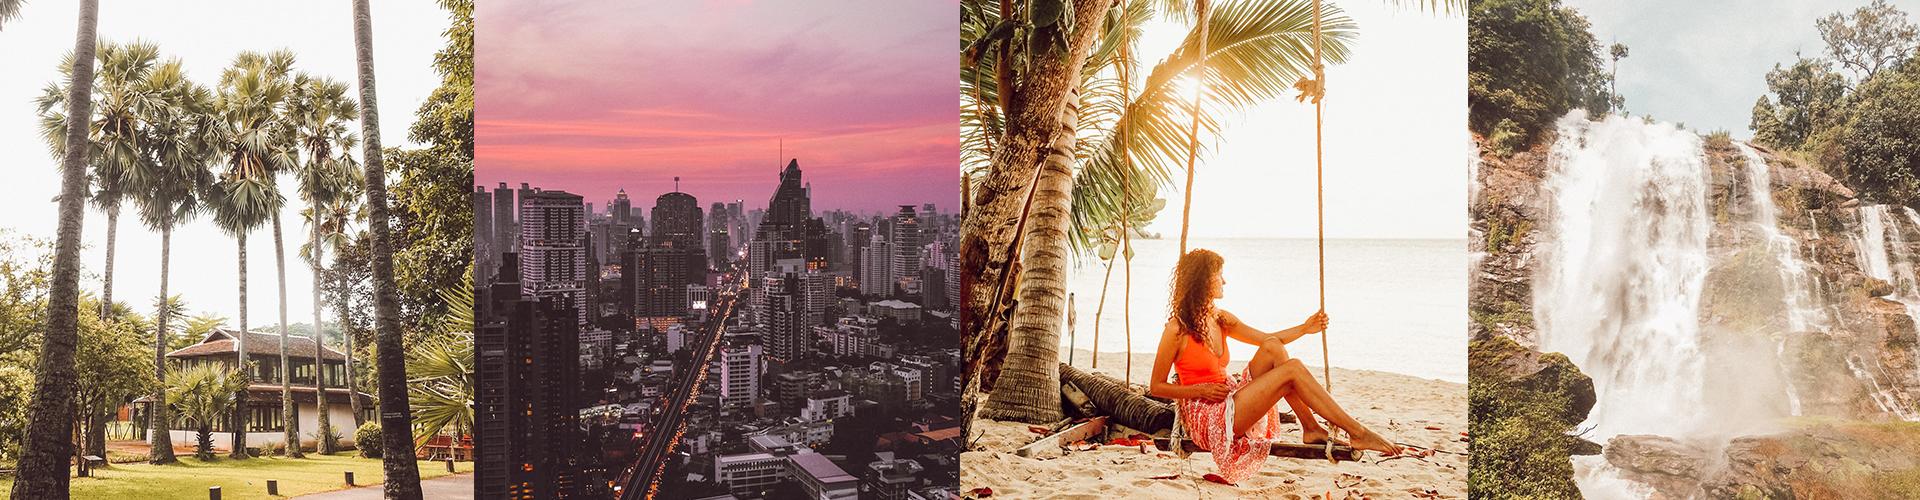 Super Detailed Thailand Travel Guide